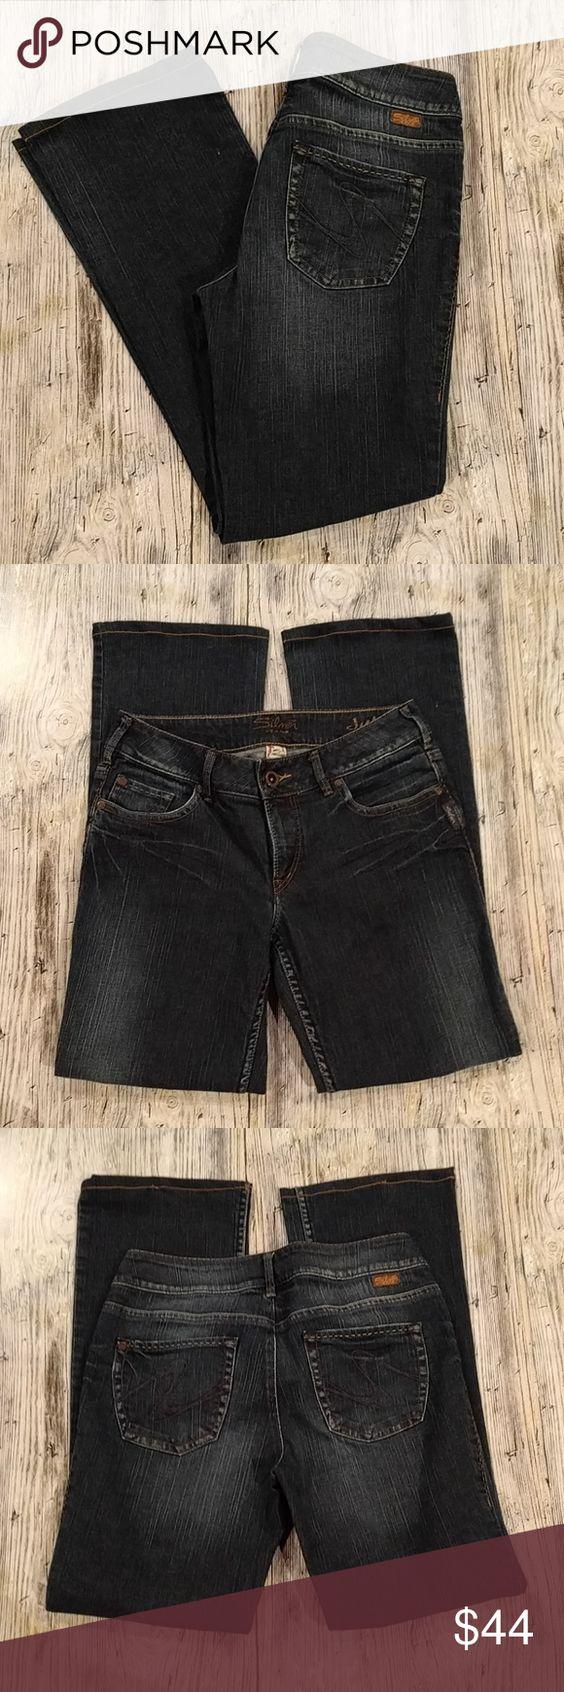 Size 29 Silver Jeans Conversion Billie Jean